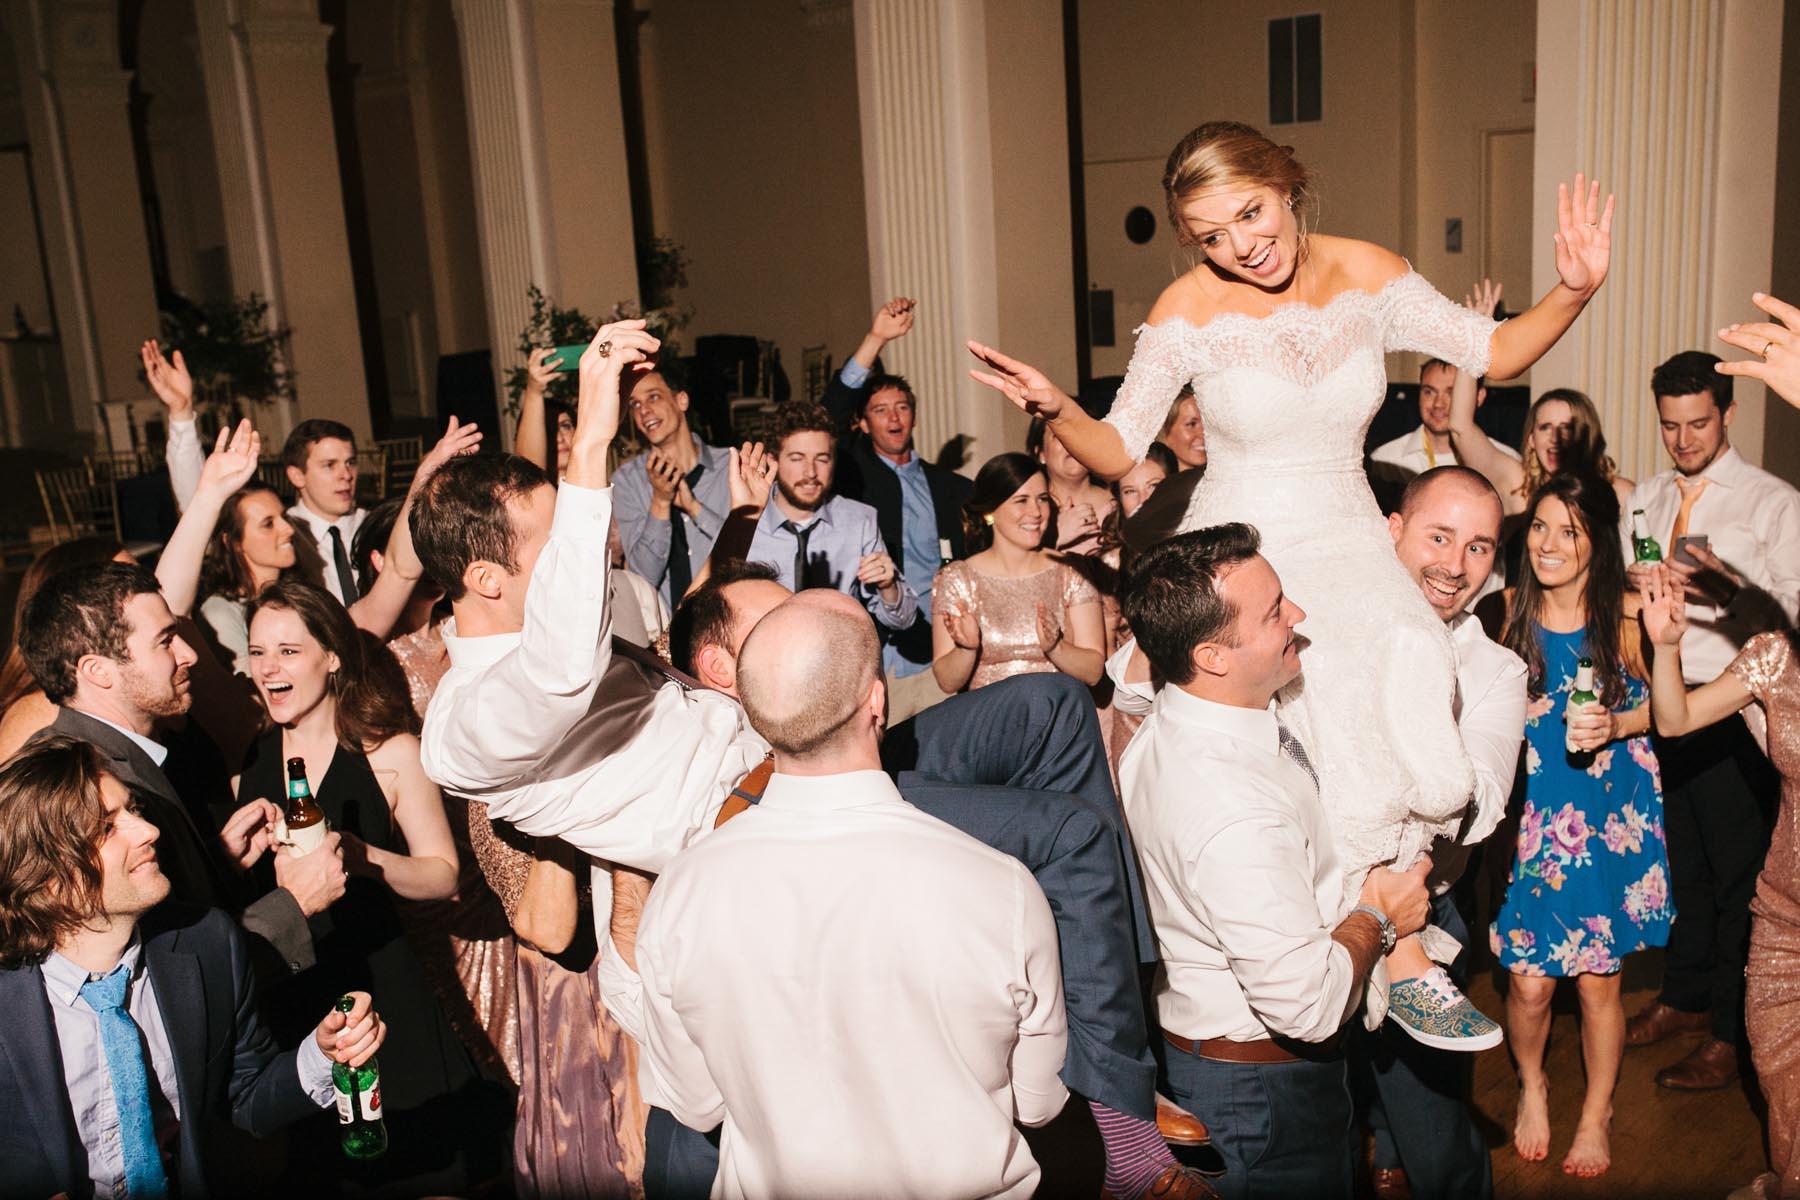 kjellman wedding blog biltmore wedding -130